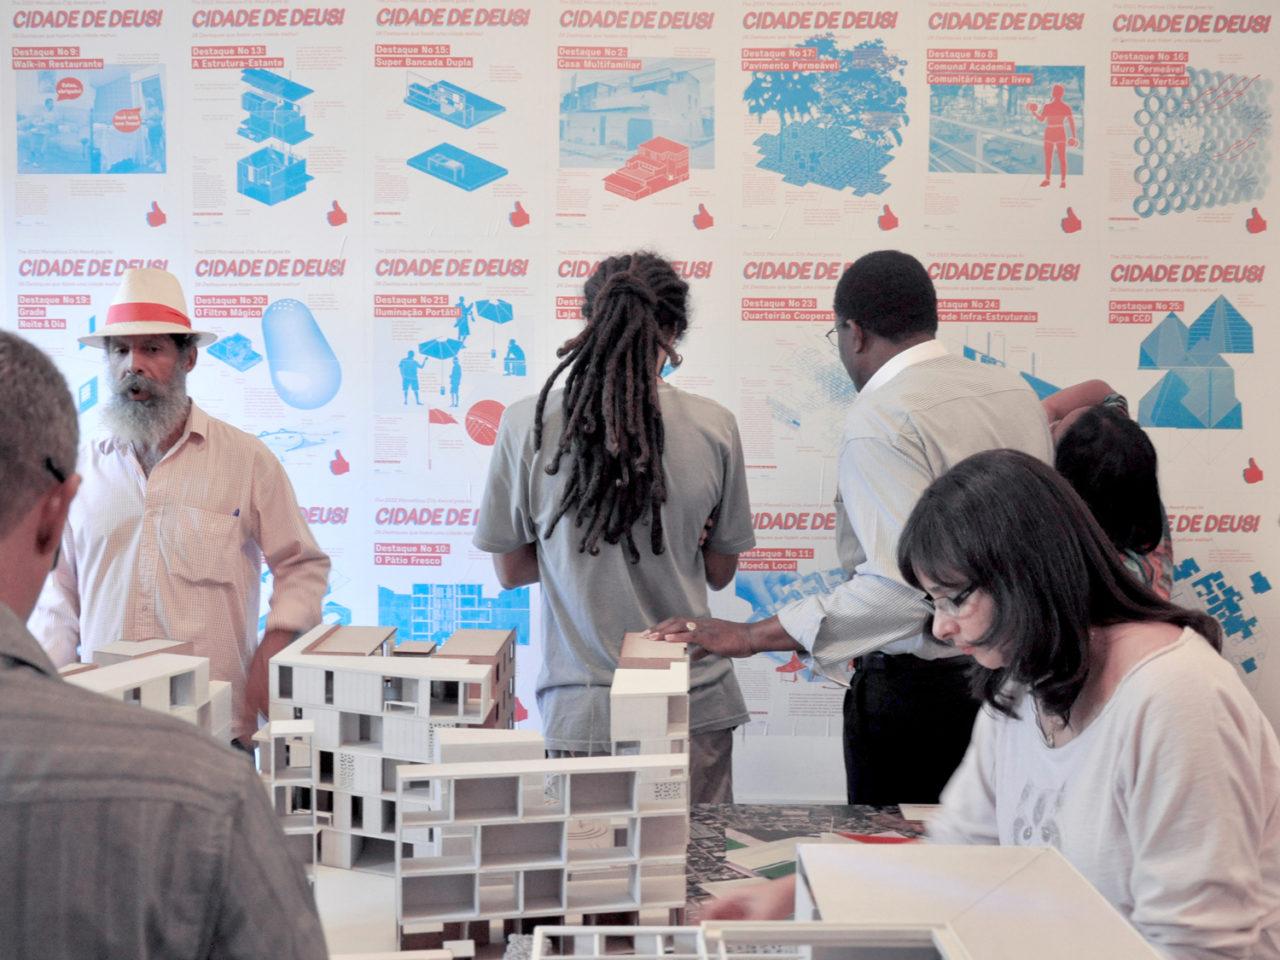 NL17: MAS Urban Design – Mastering Urban Developments in Emerging Territories